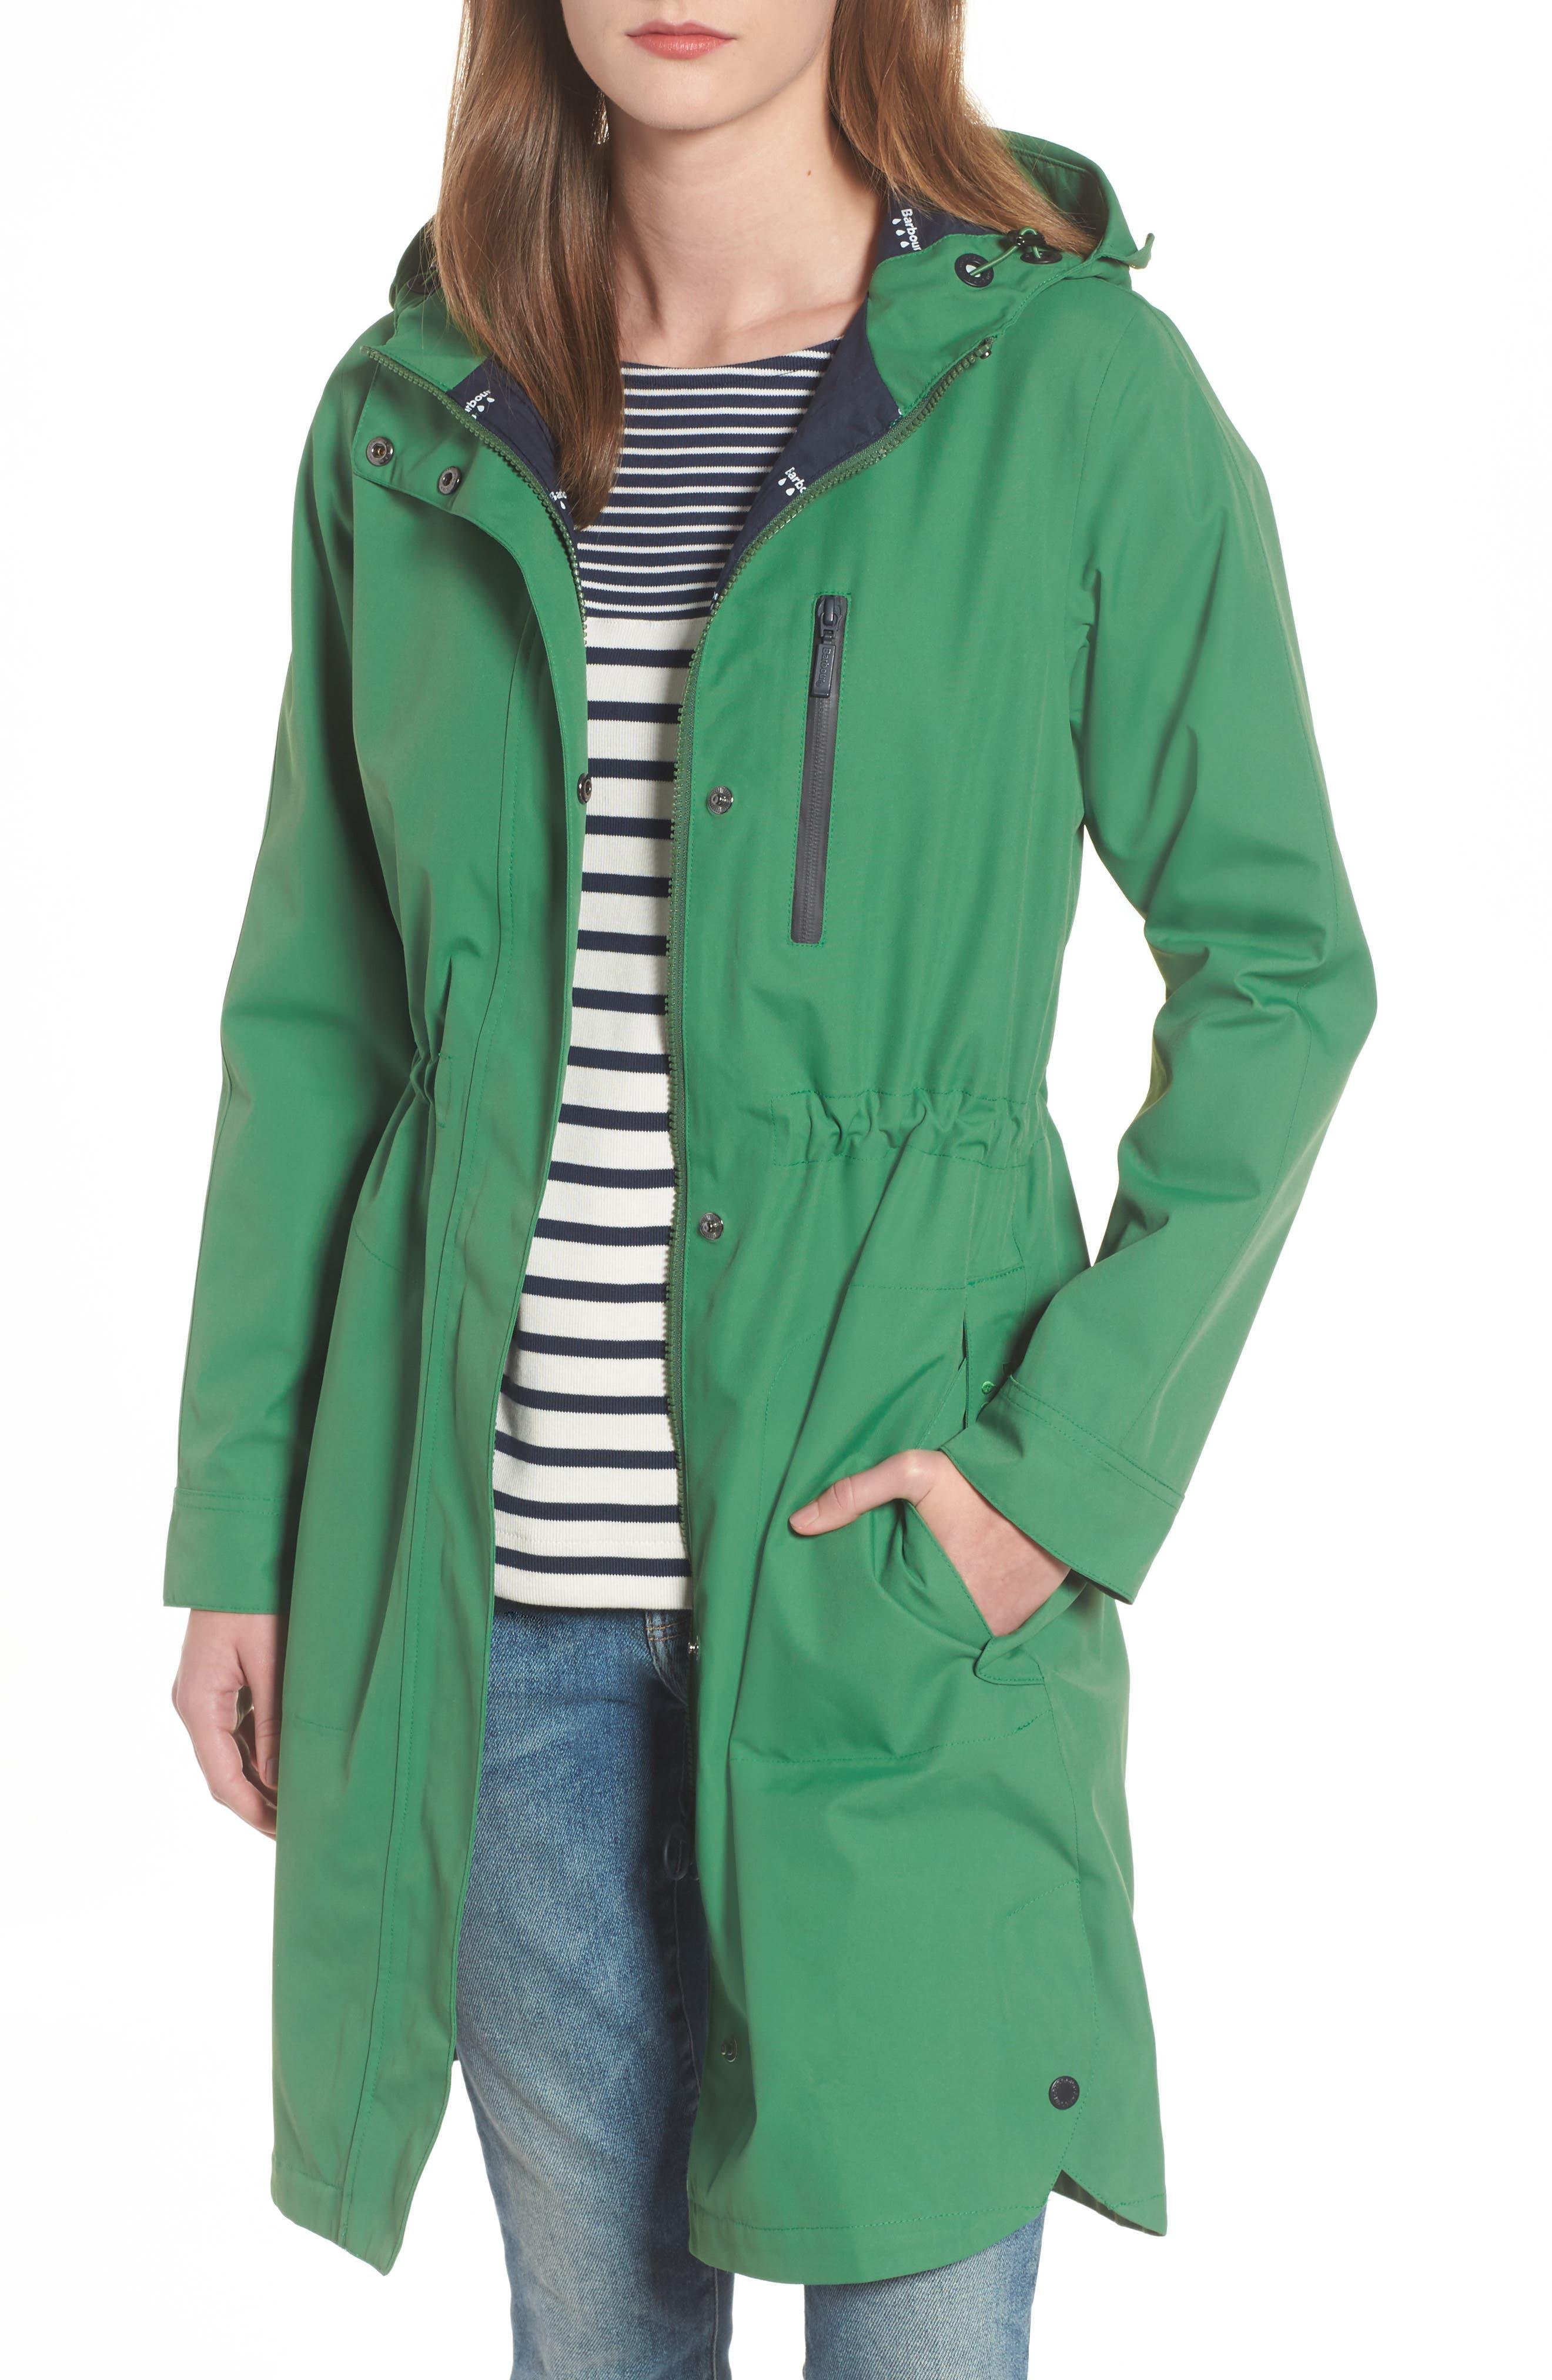 Sleet Hooded Jacket,                             Main thumbnail 1, color,                             Clover